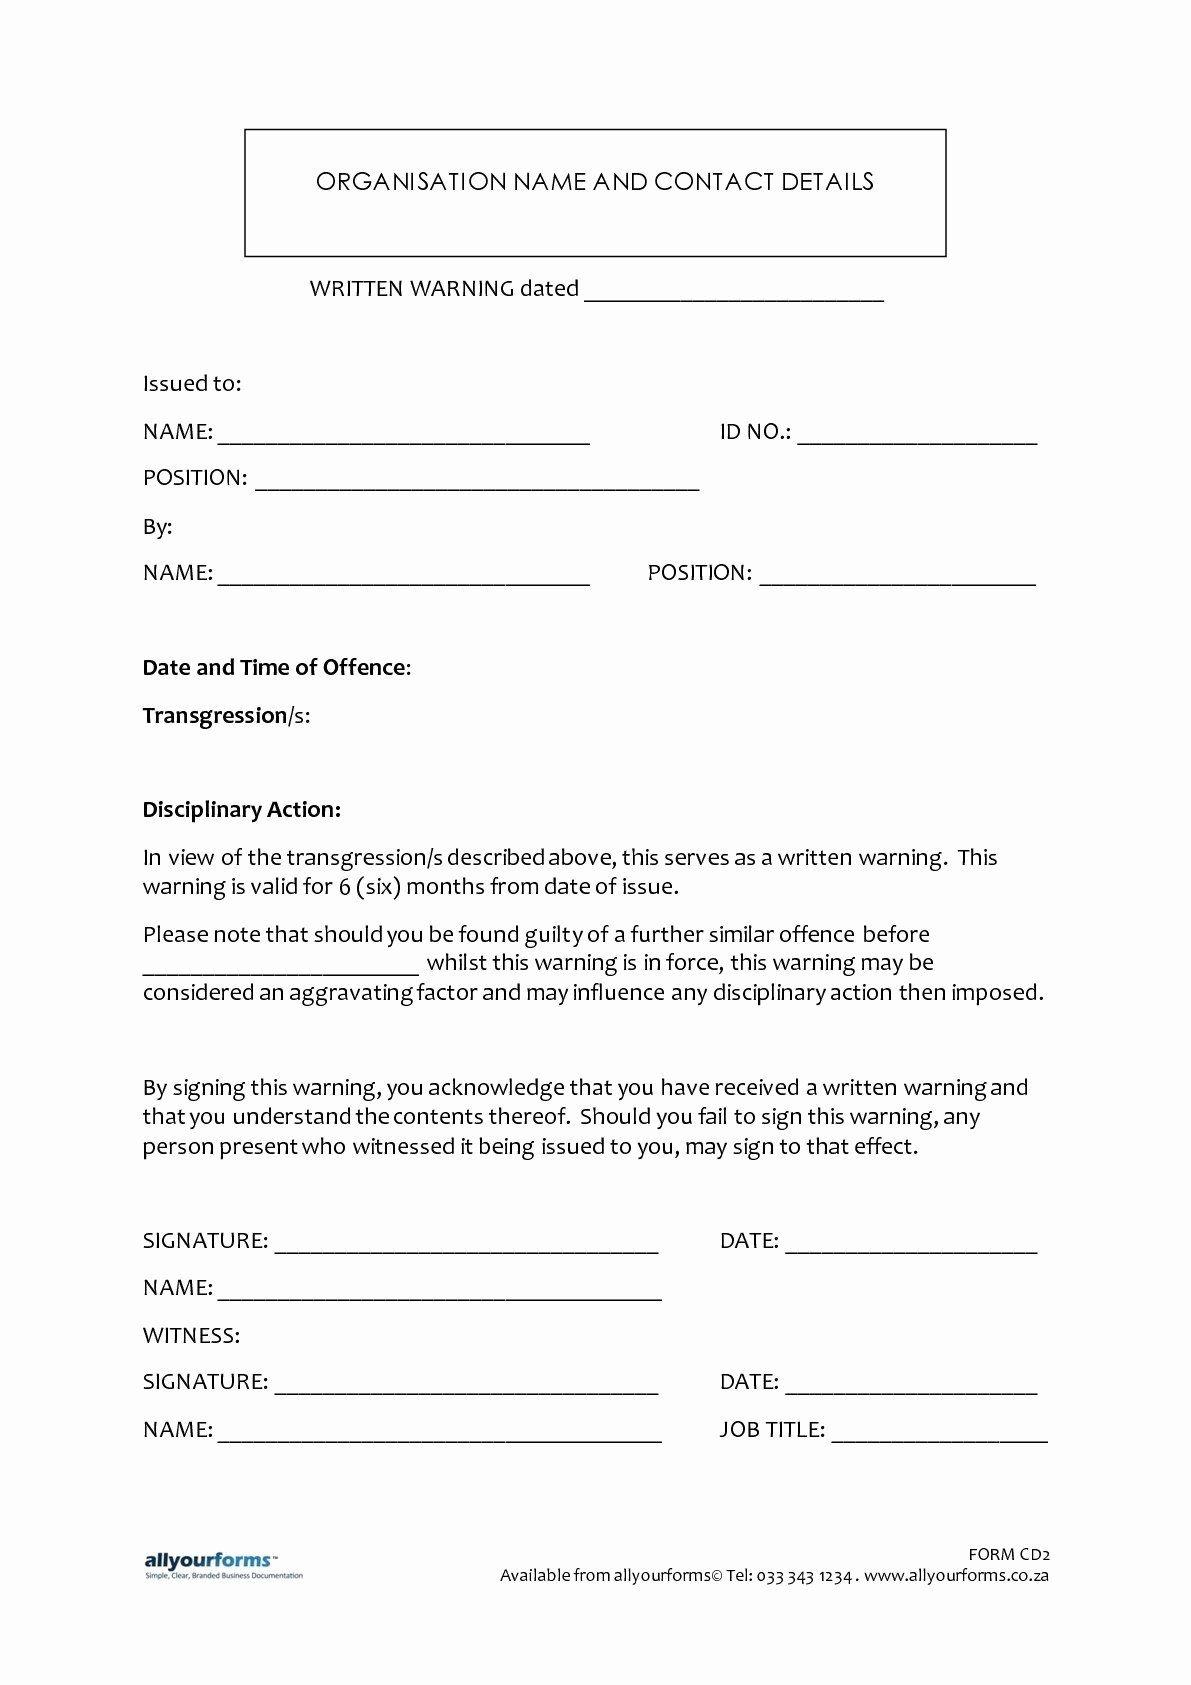 Sample Written Warning Letter Best Of Sample Written Warning Letter To Employee Simple Cover Letter Template Professional Cover Letter Template Templates